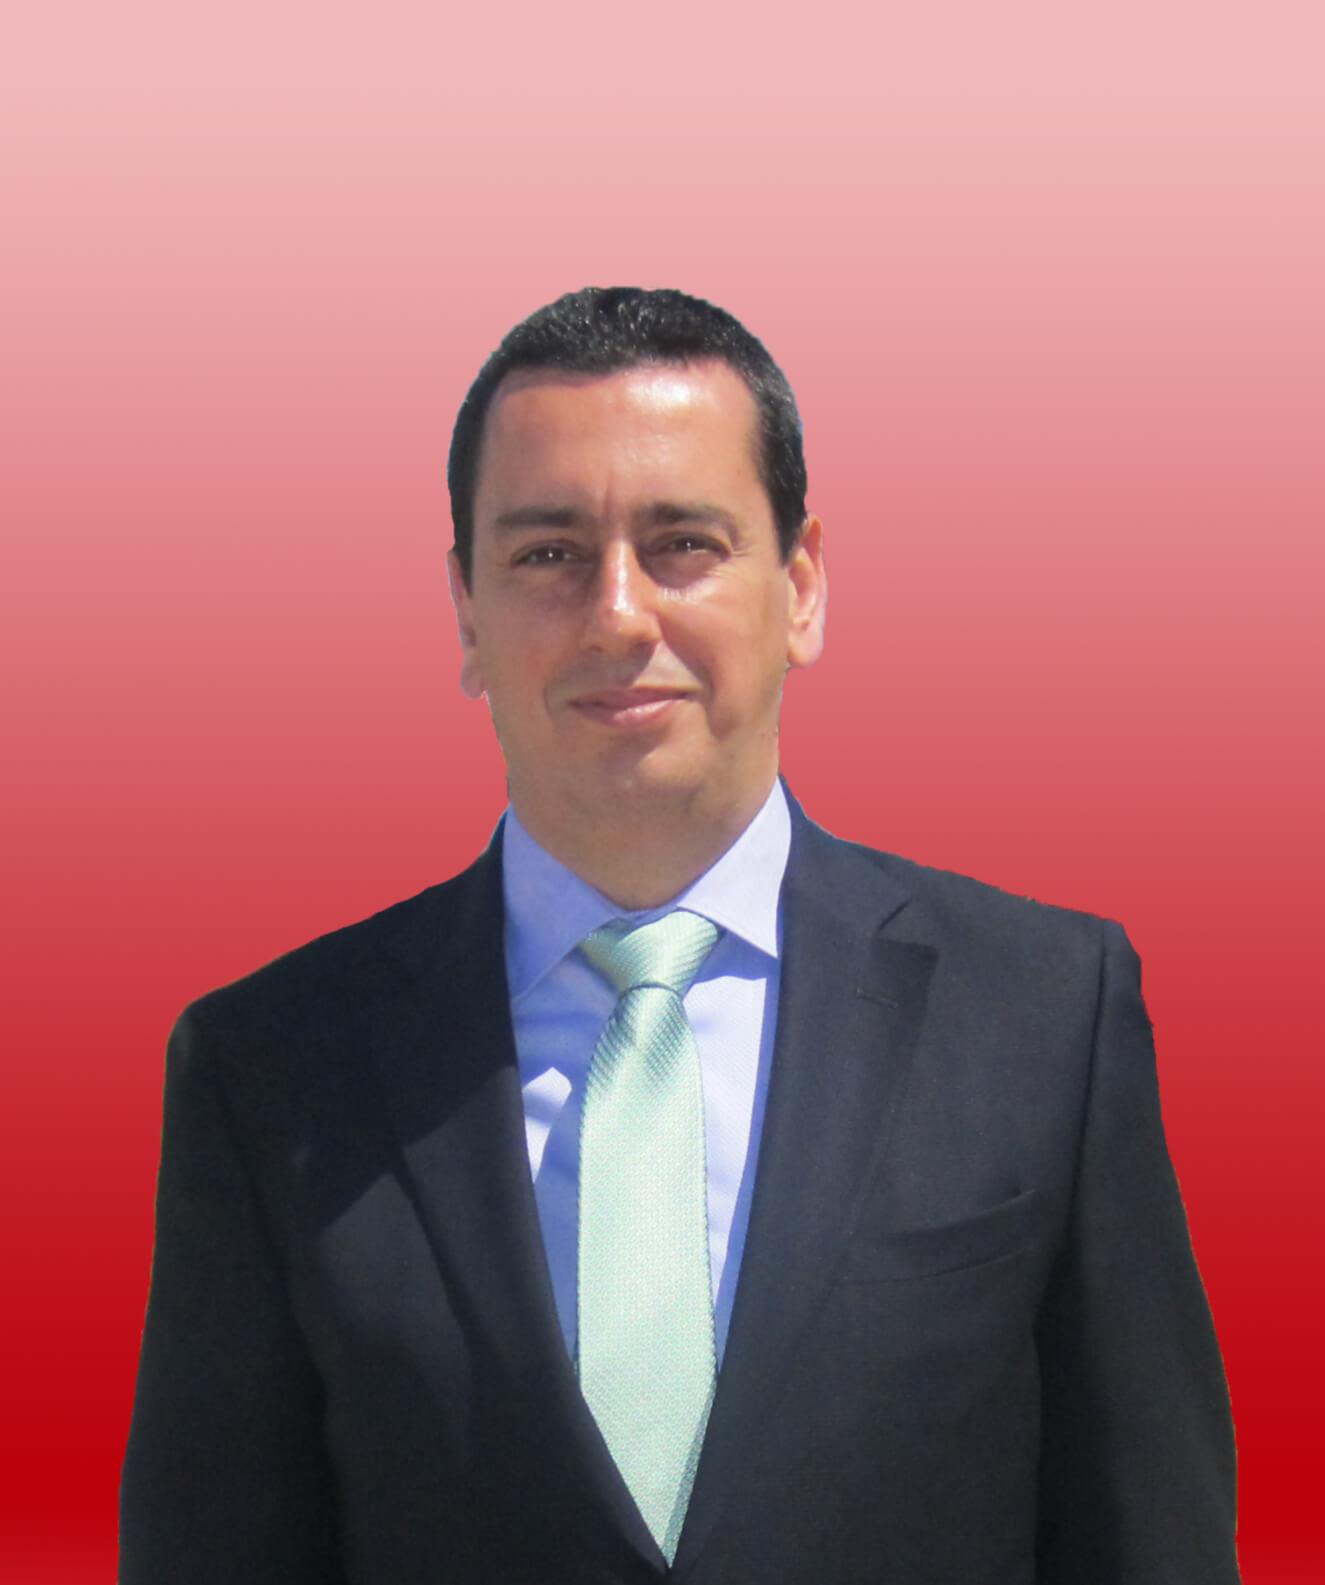 Alfonso Valenzuela García